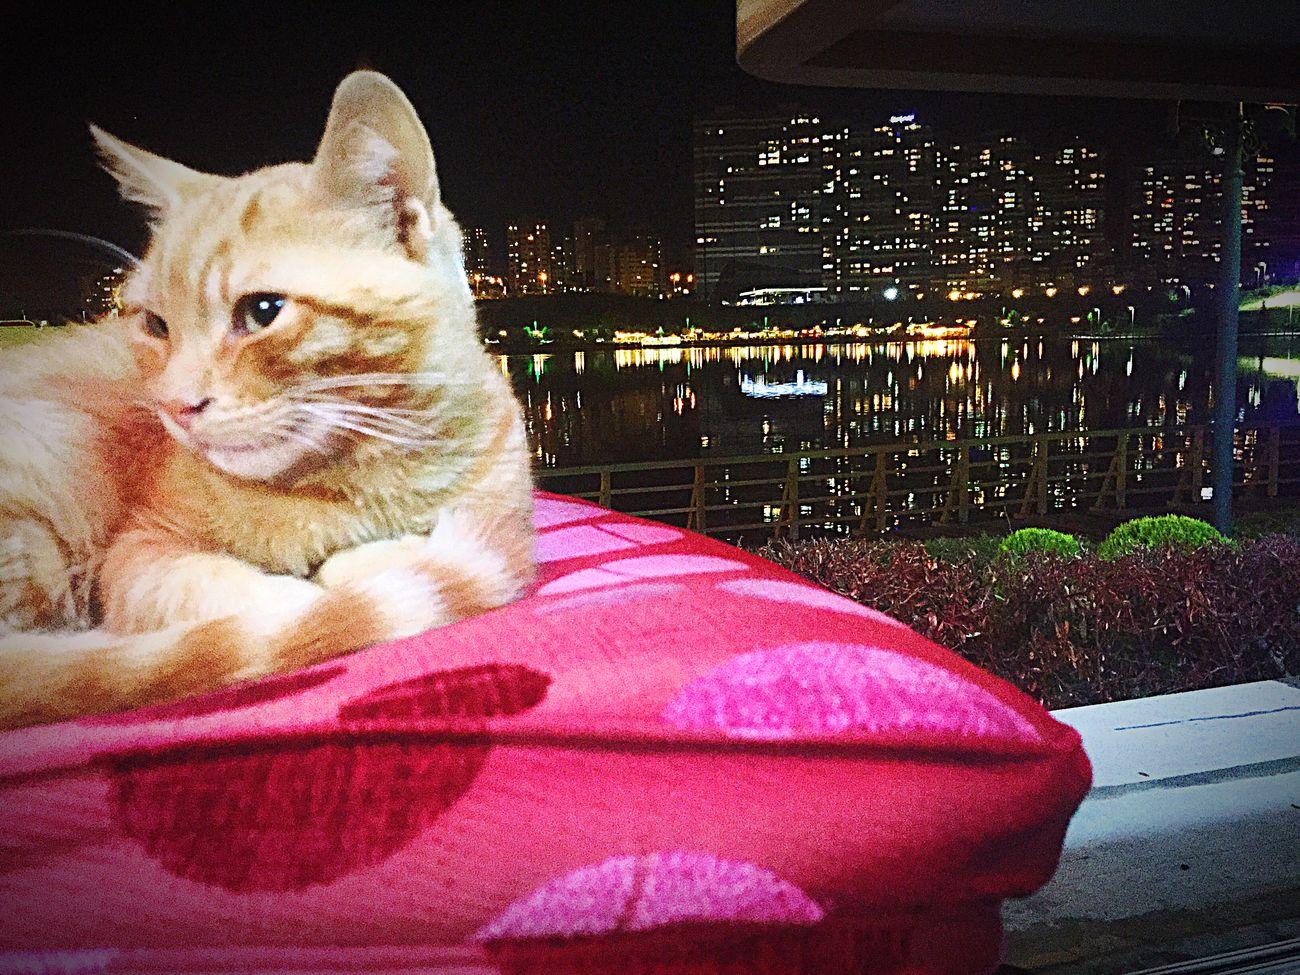 Cat Cat♡ Cats Catsofinstagram Cat Lovers Catsagram Night Goksu Goksupark Eye4photography